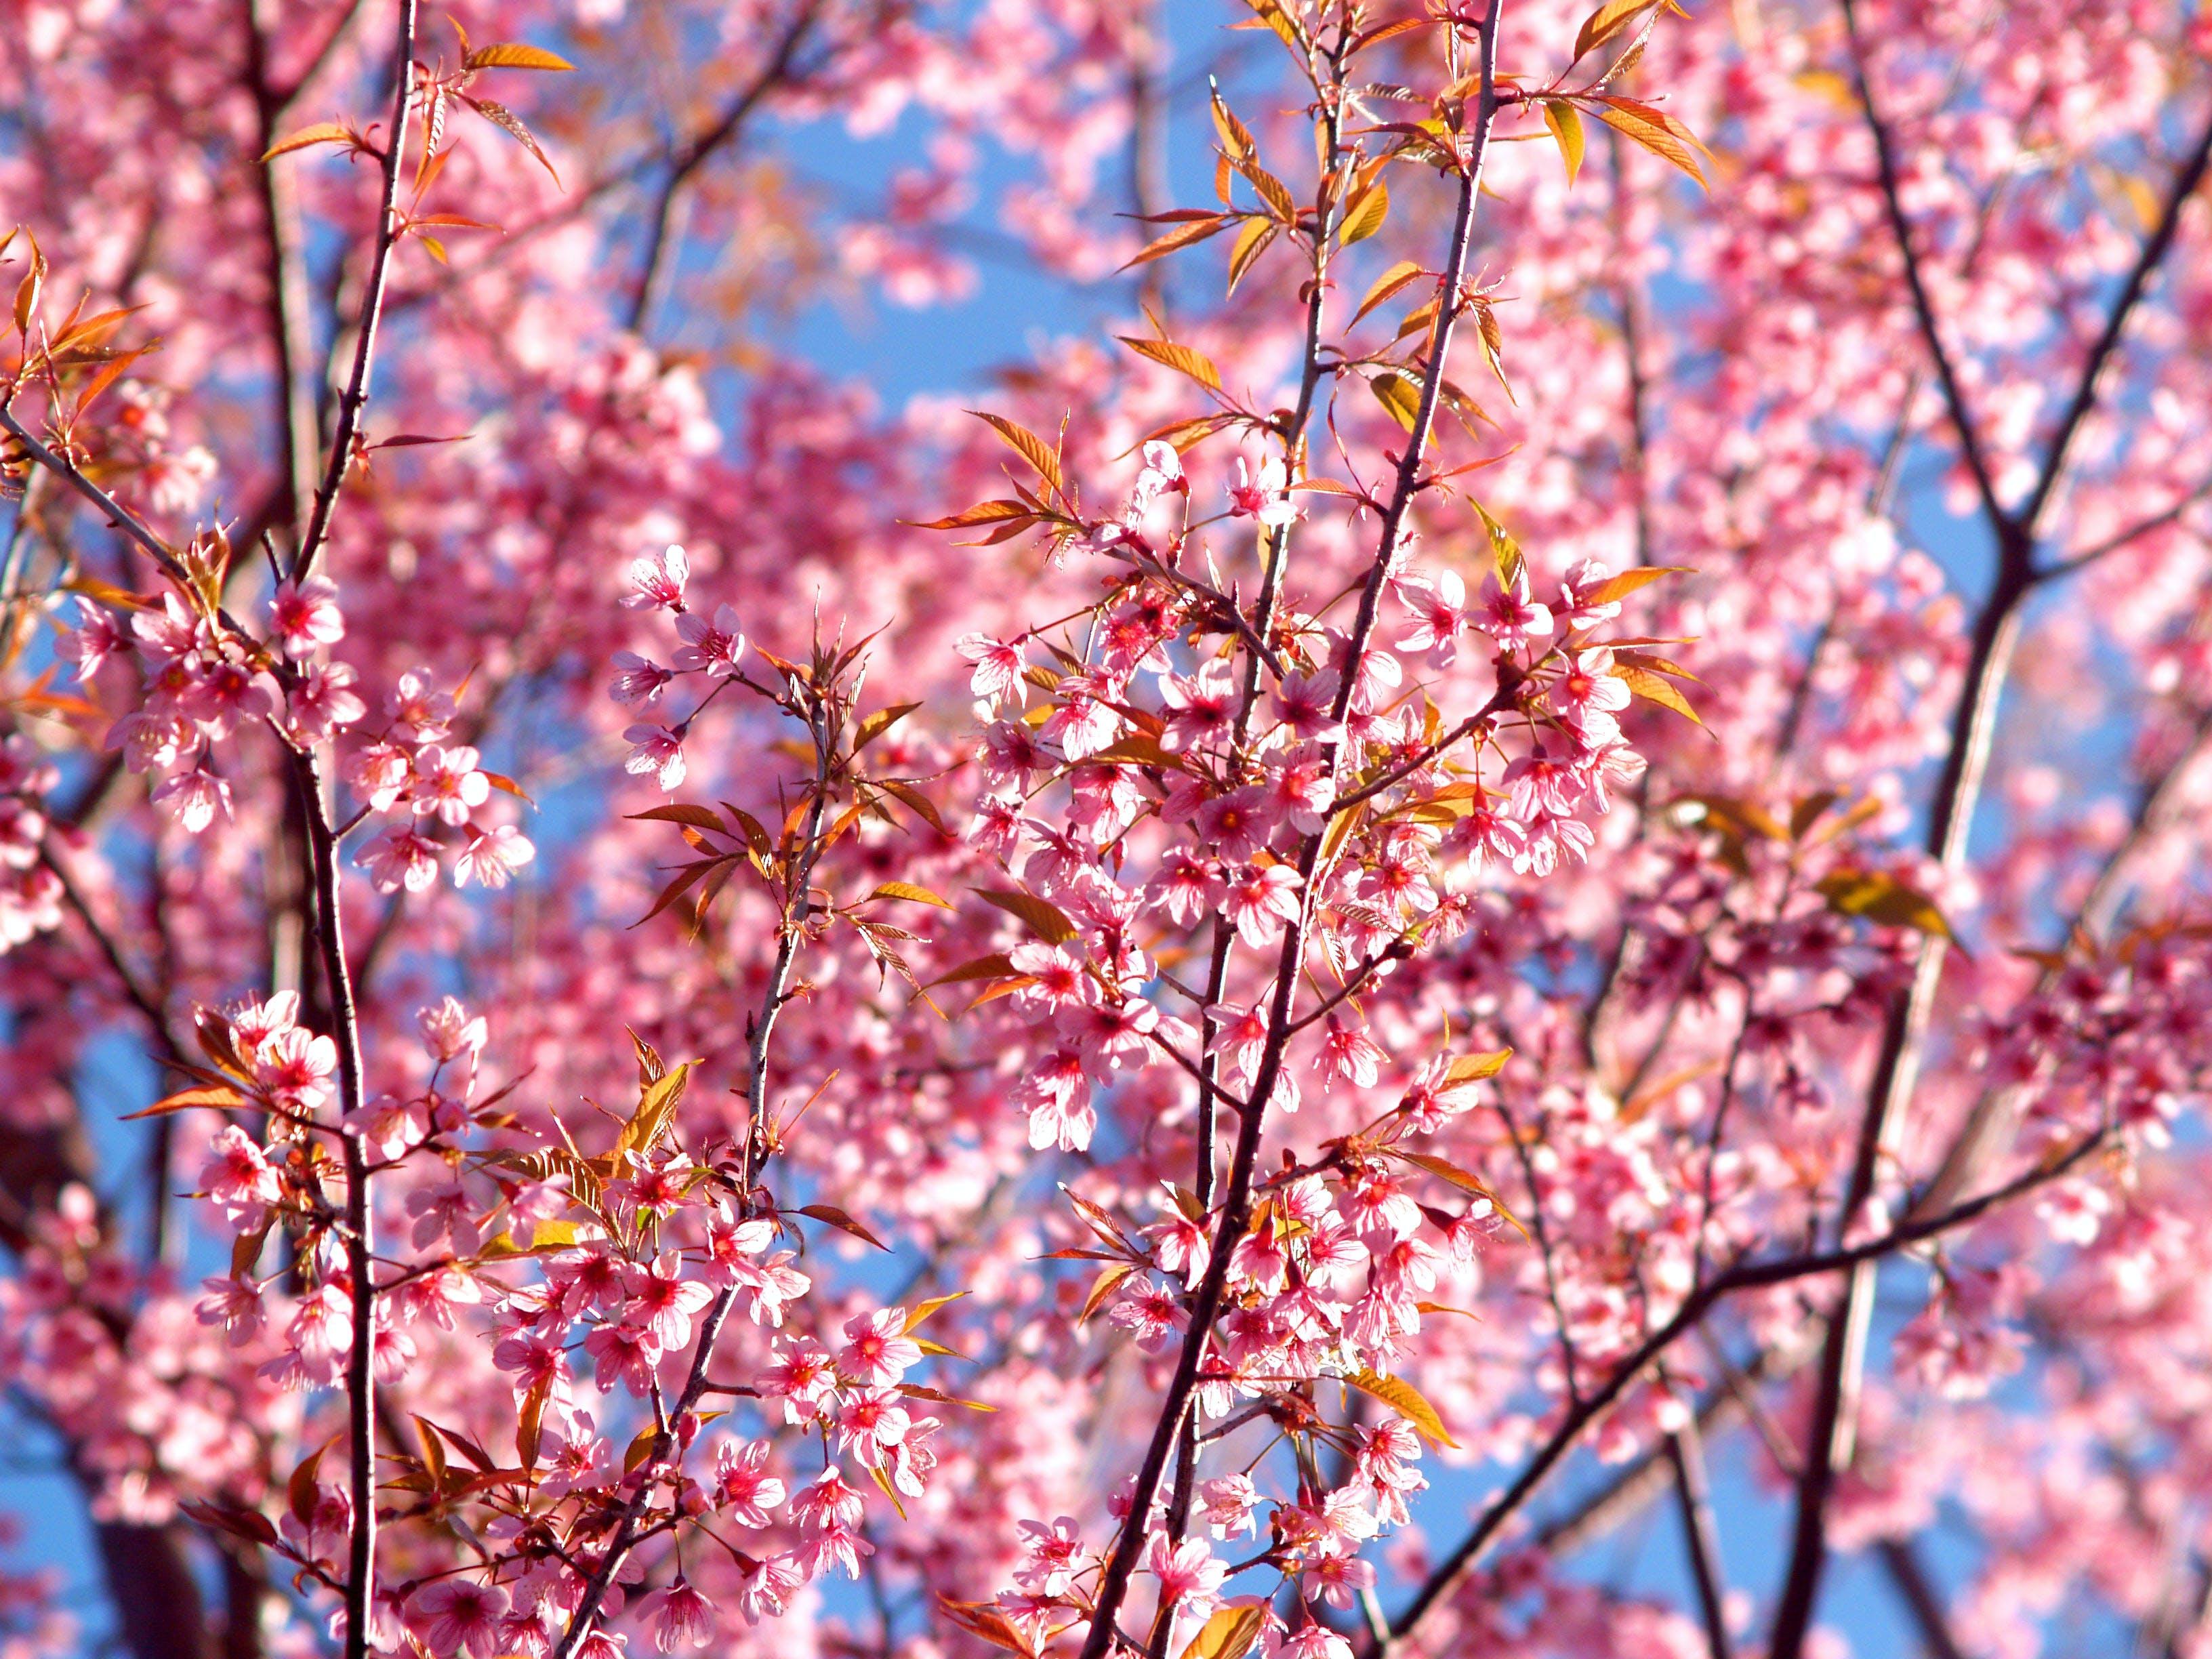 Free stock photo of landscape, nature, romantic, flowers